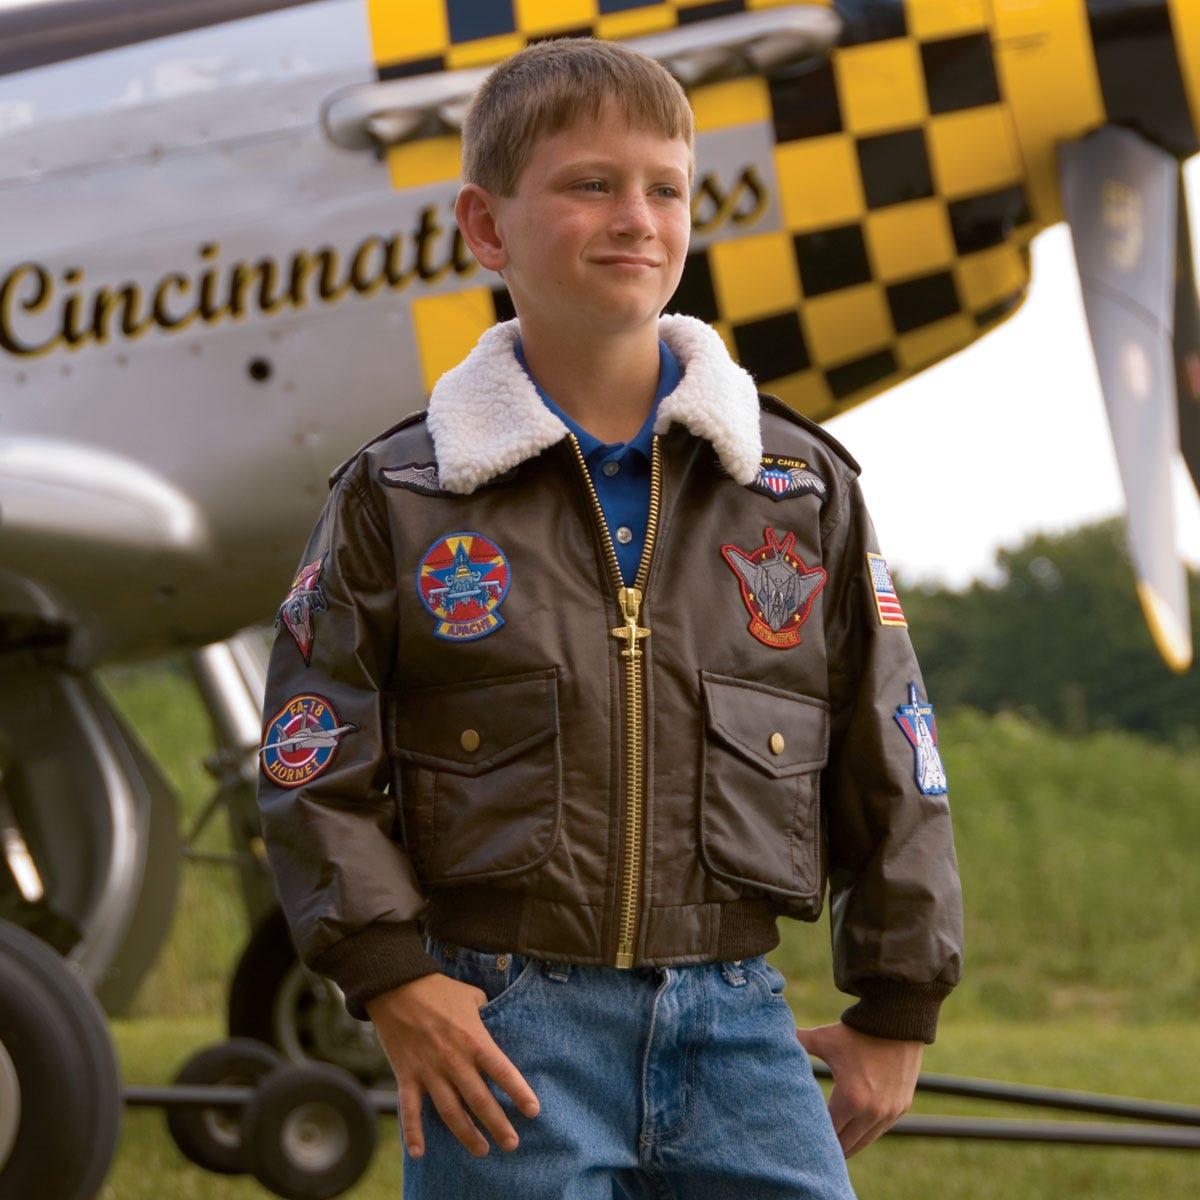 Children's Bomber Jacket - from Sporty's Pilot Shop